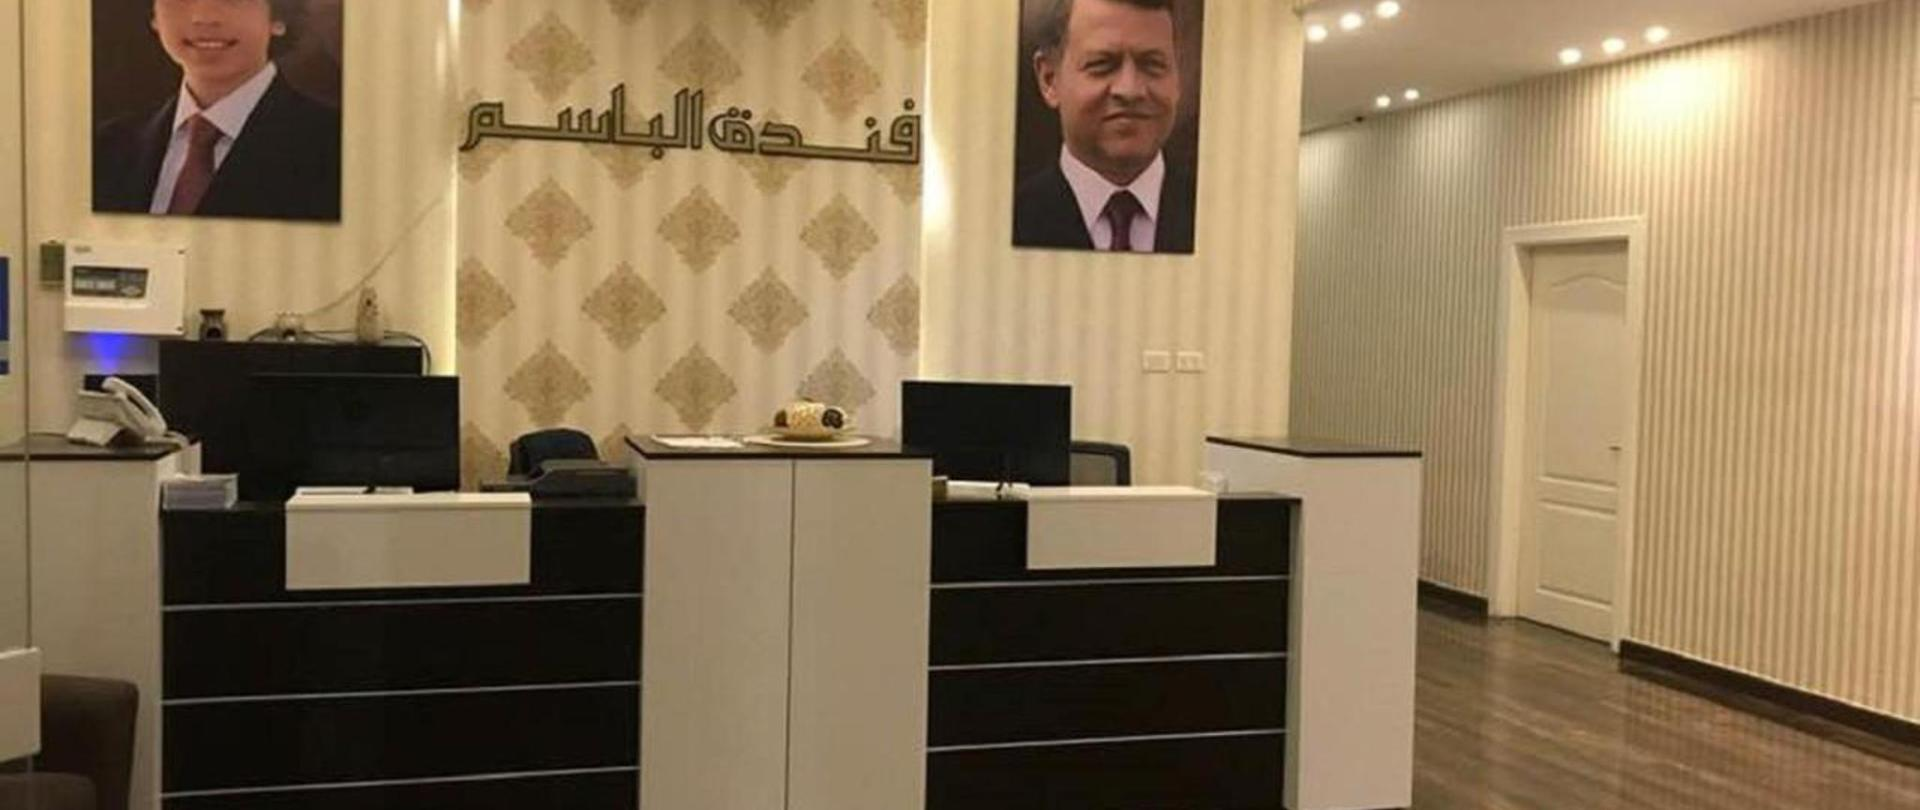 Al Basem Hotel